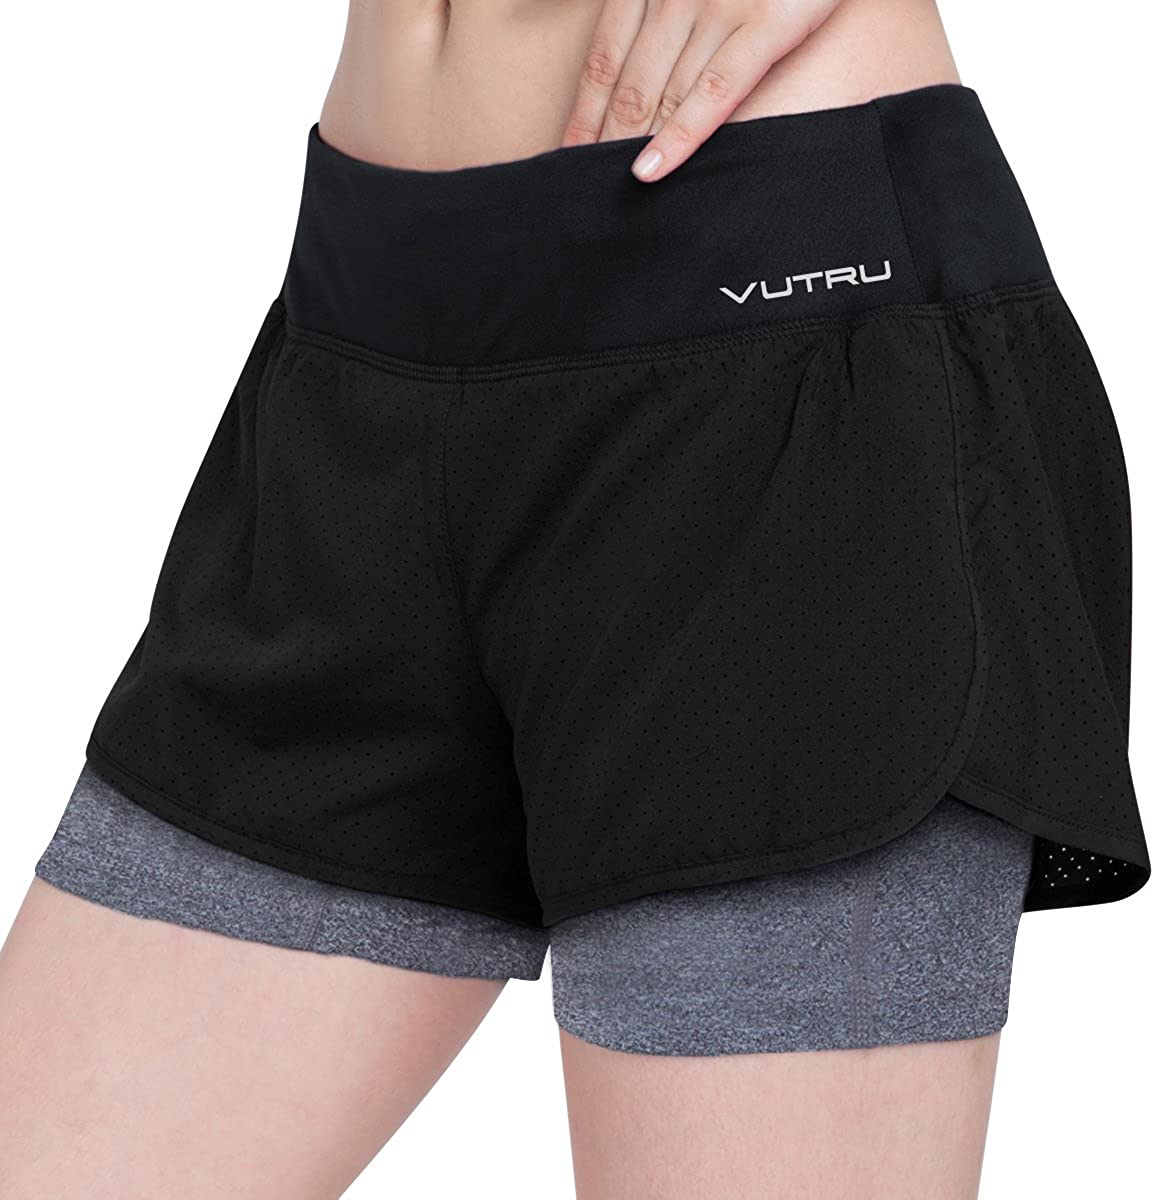 FANGNVREN Short Sport Femme,2In1 Running Shorts Women Breathable Outdoor Fitness Sports Short Training Exercise Jogging Yoga Shorts Sportswear Black